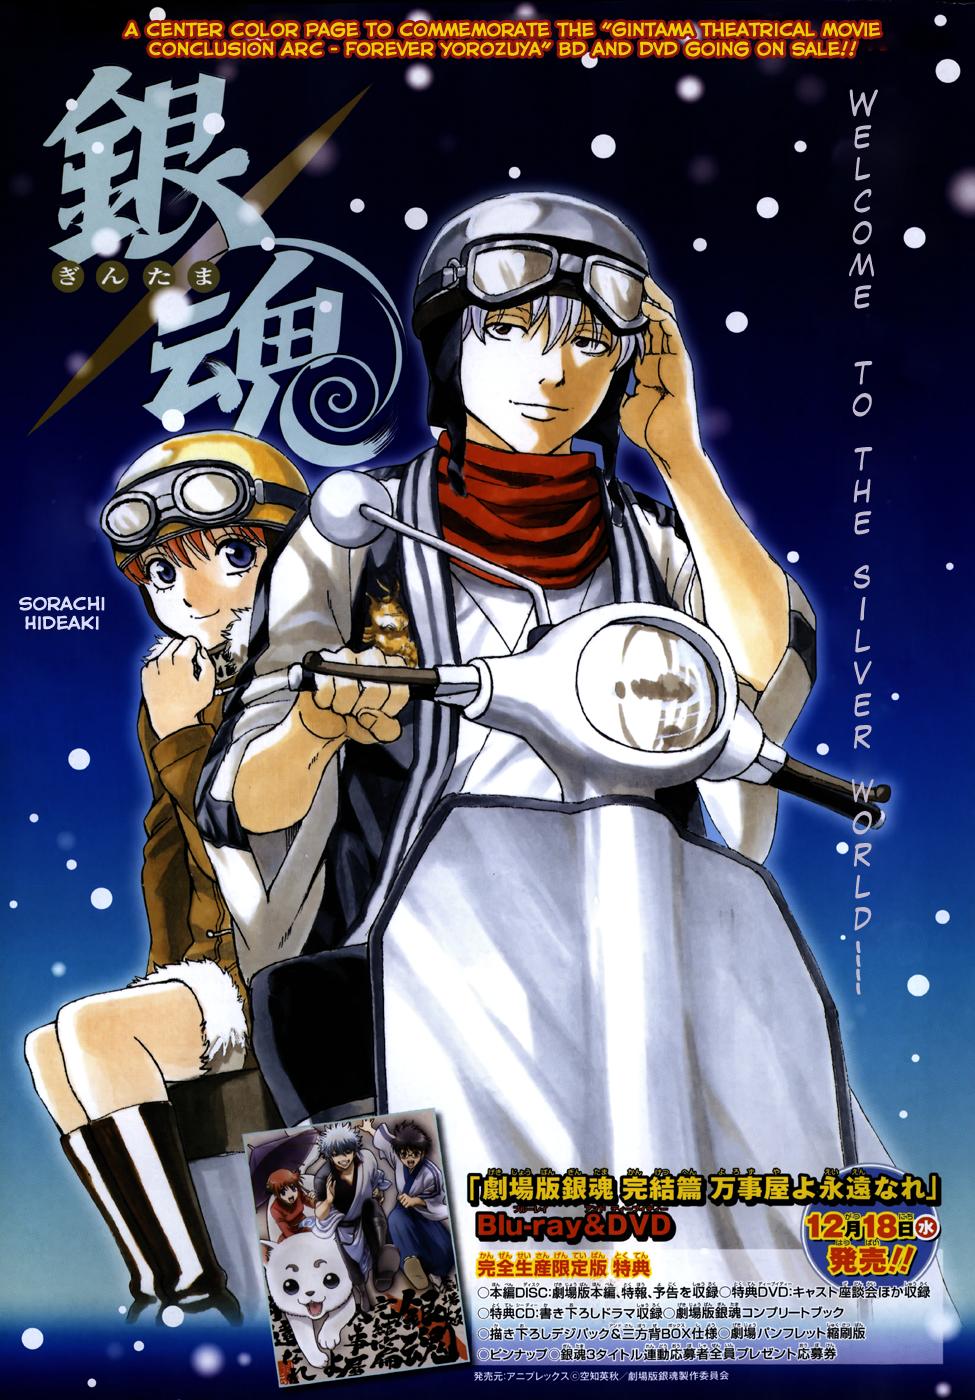 Gintama Chapter 474 Manga Manga Covers Anime